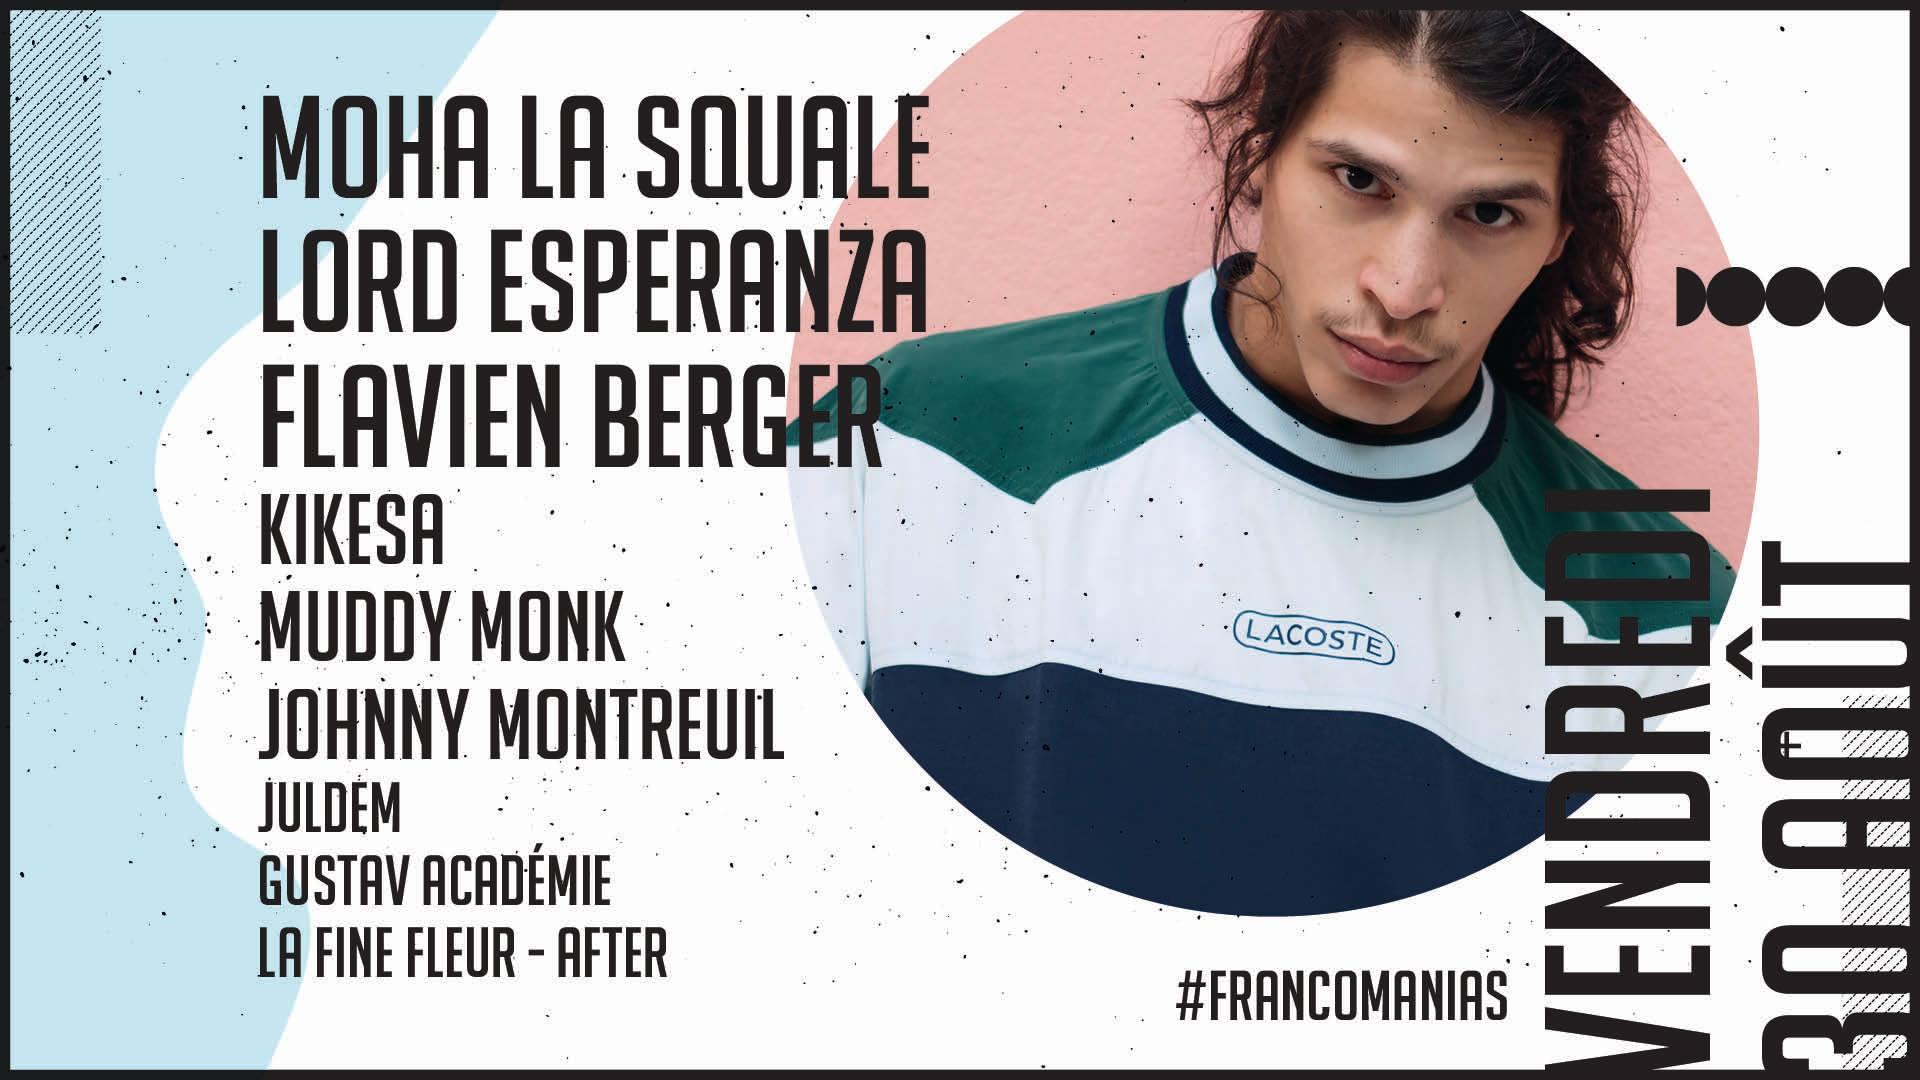 Moha La Squale @ Francomanias